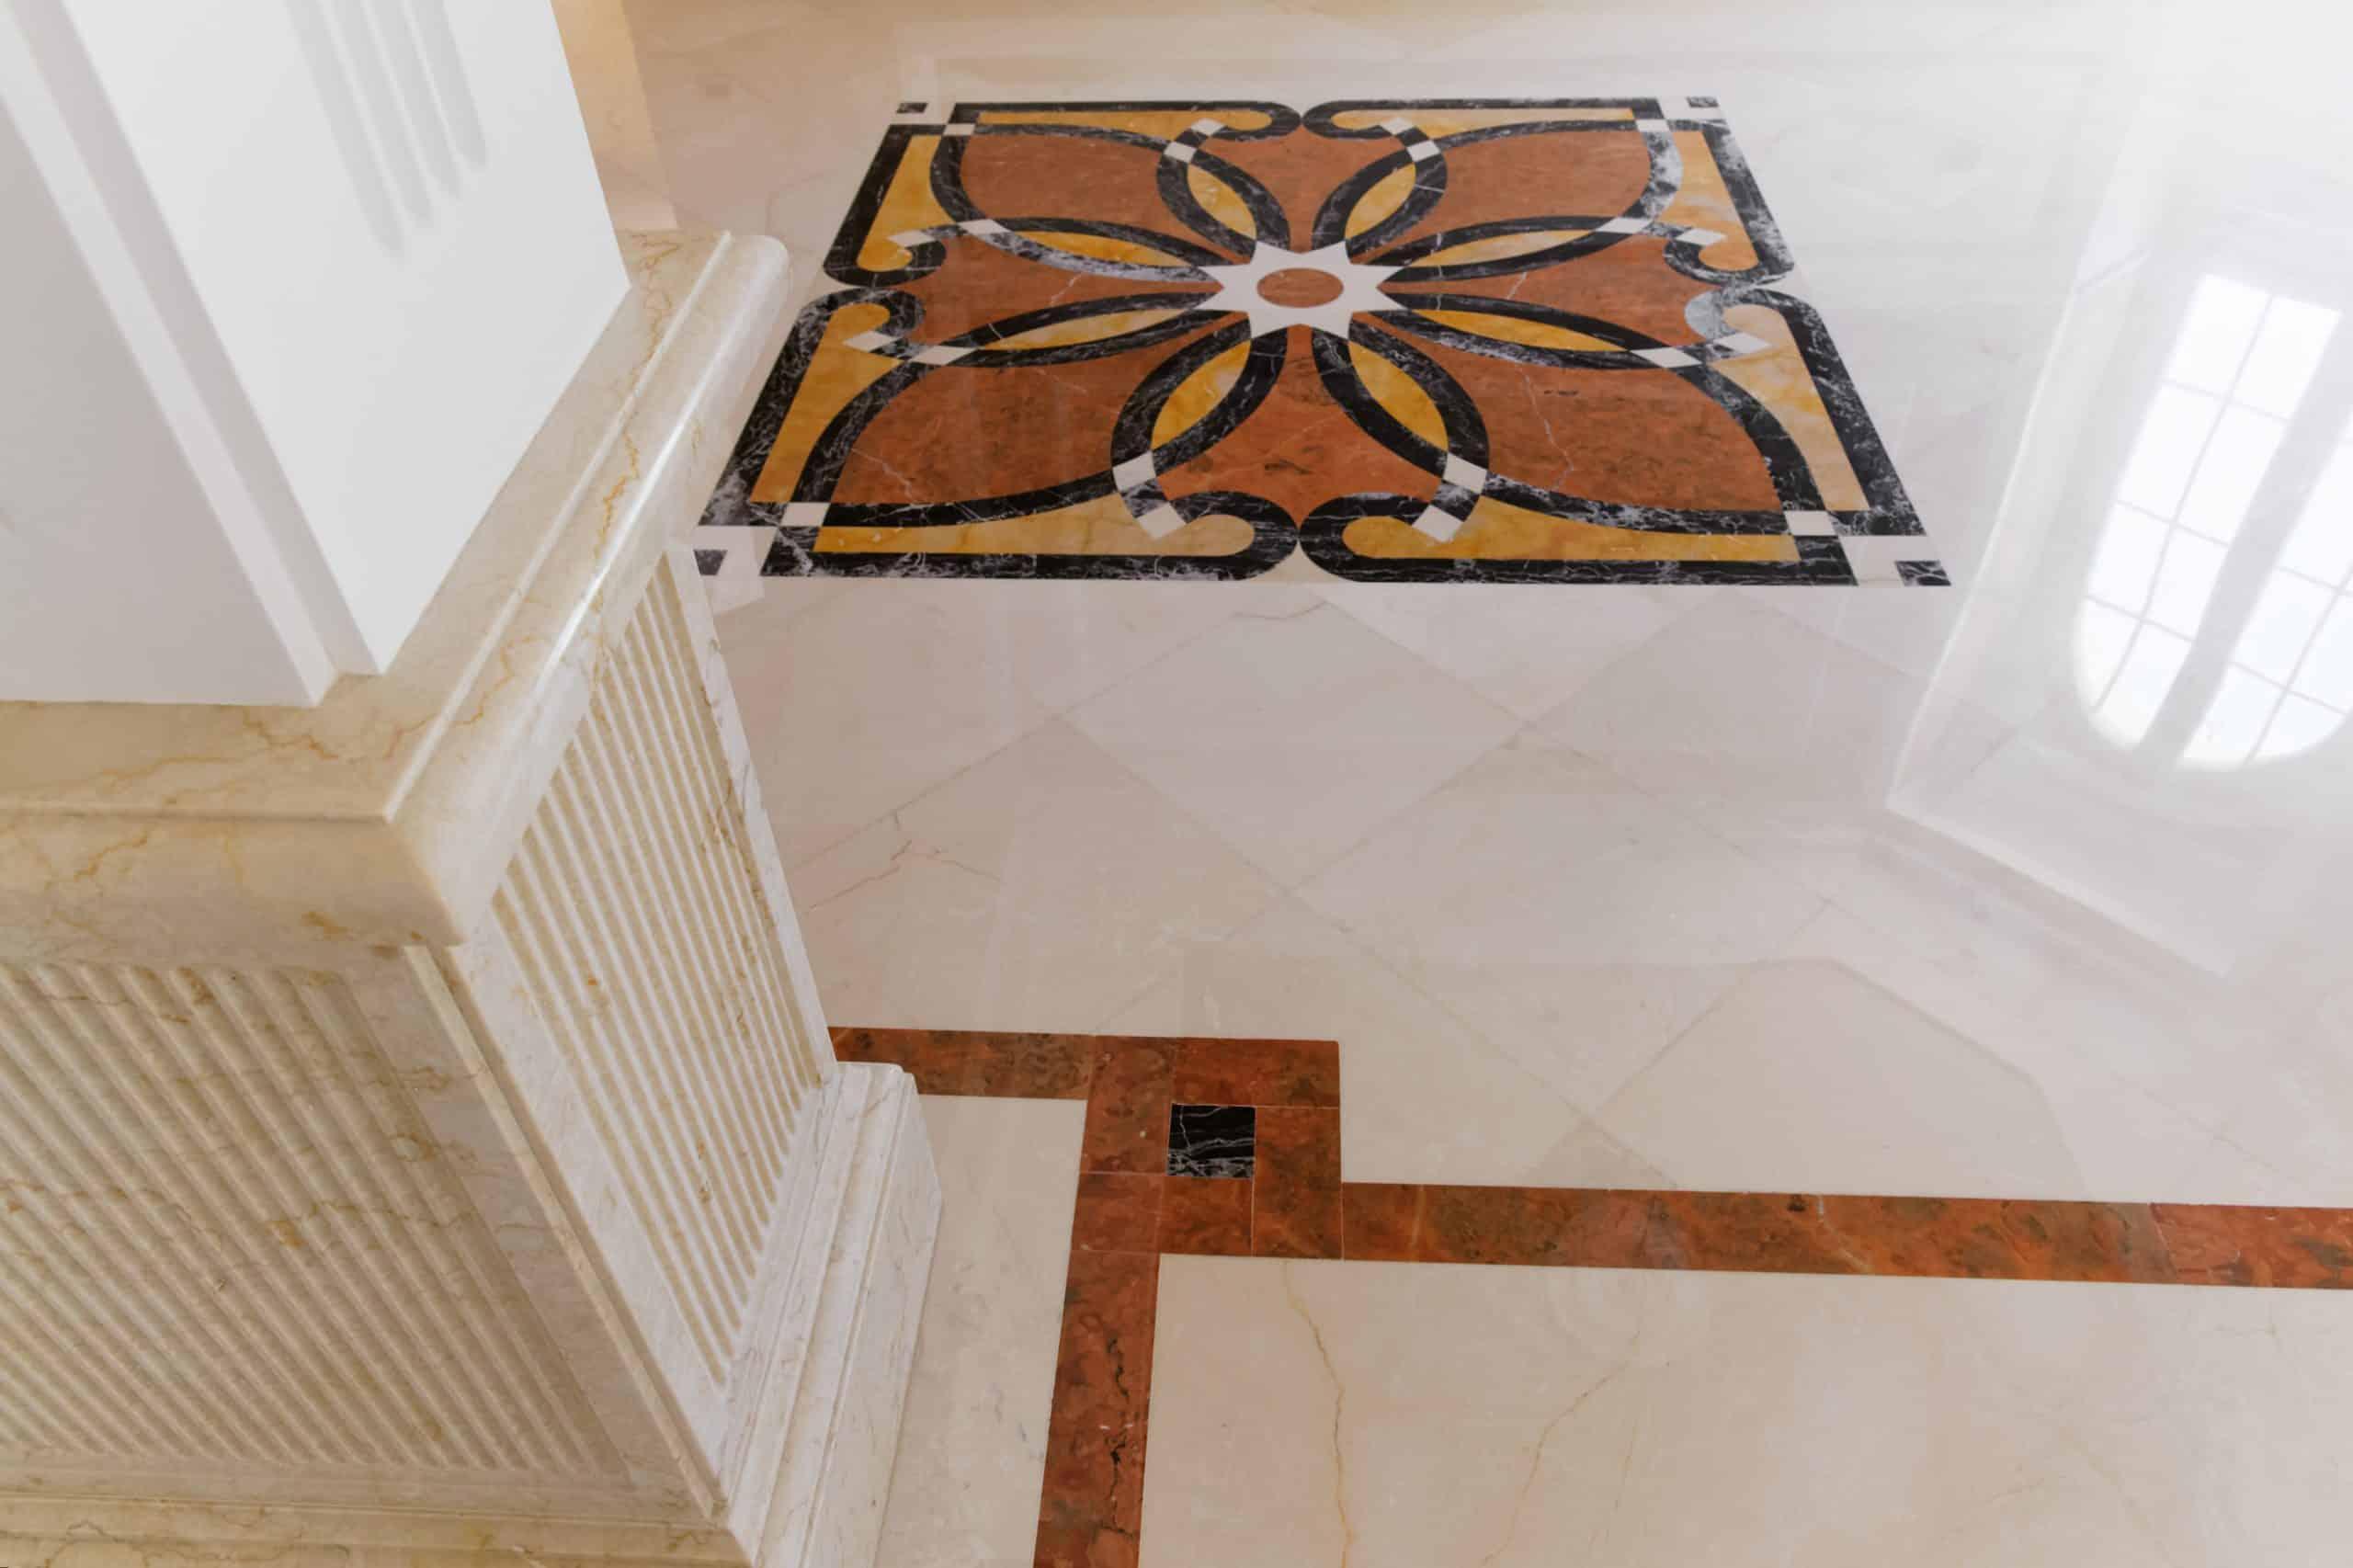 villa pavimento marmo intarsio carpet avorio 6 scaled